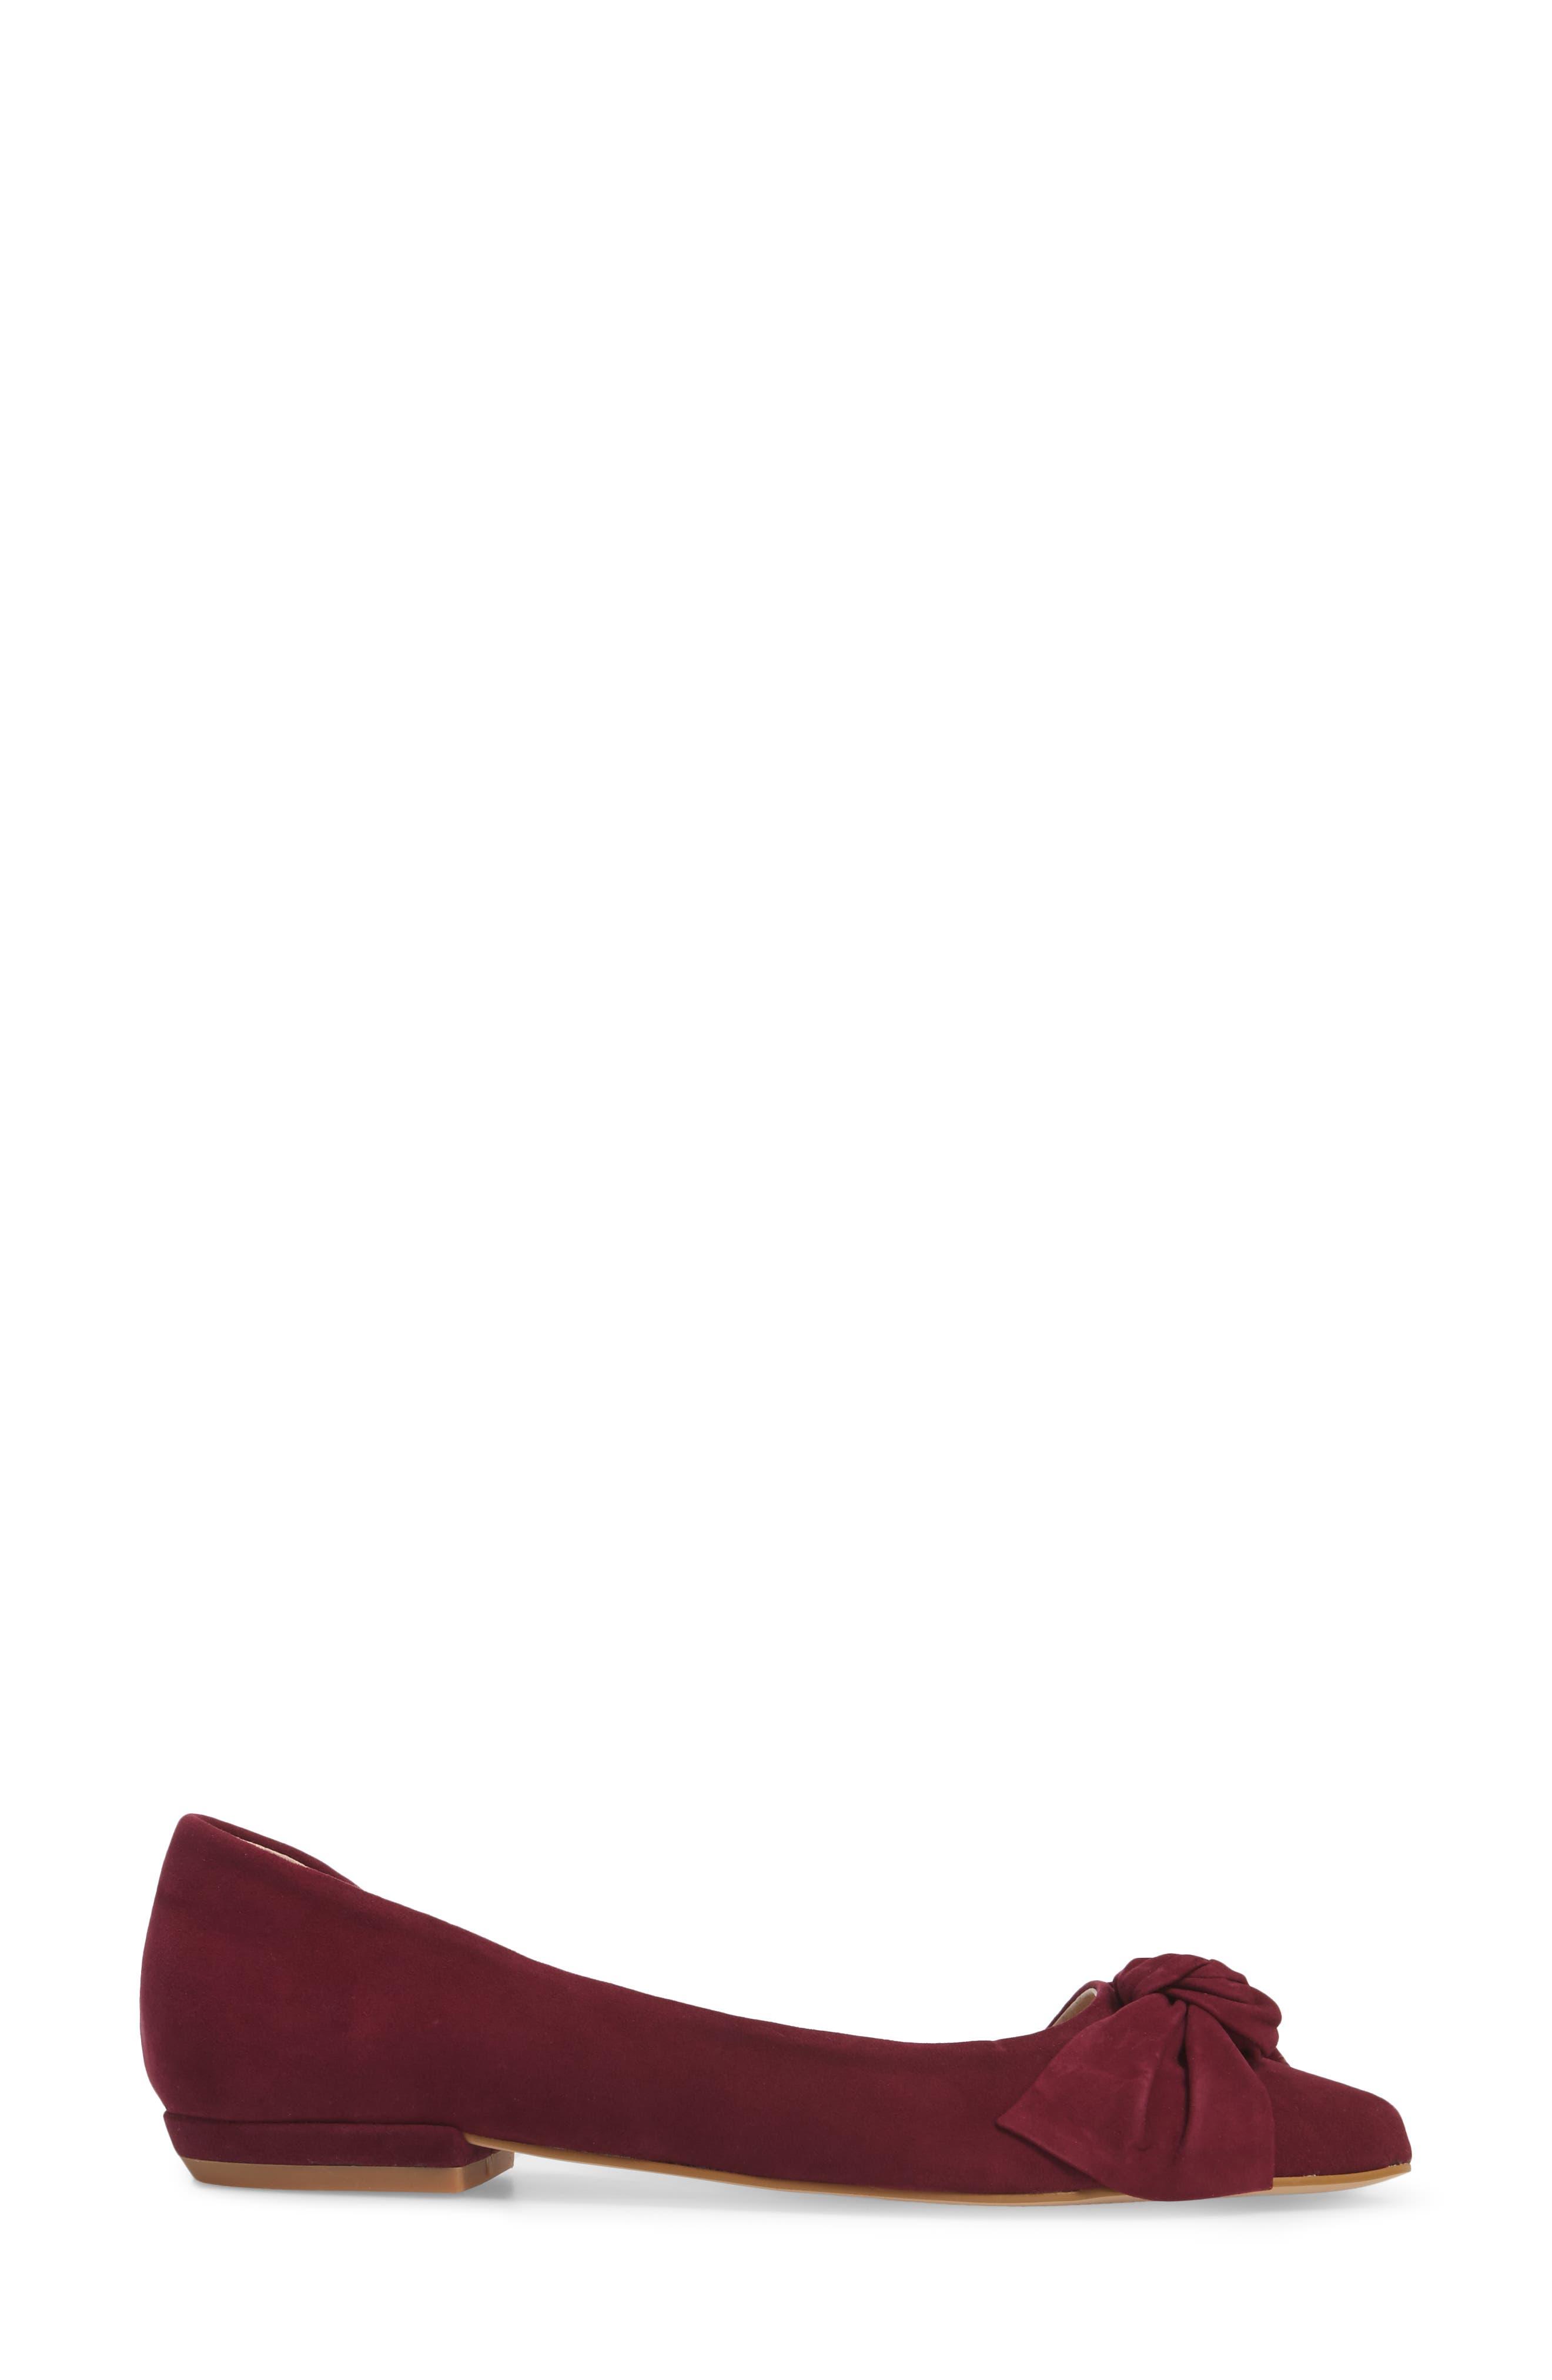 Edina d'Orsay Bow Flat,                             Alternate thumbnail 9, color,